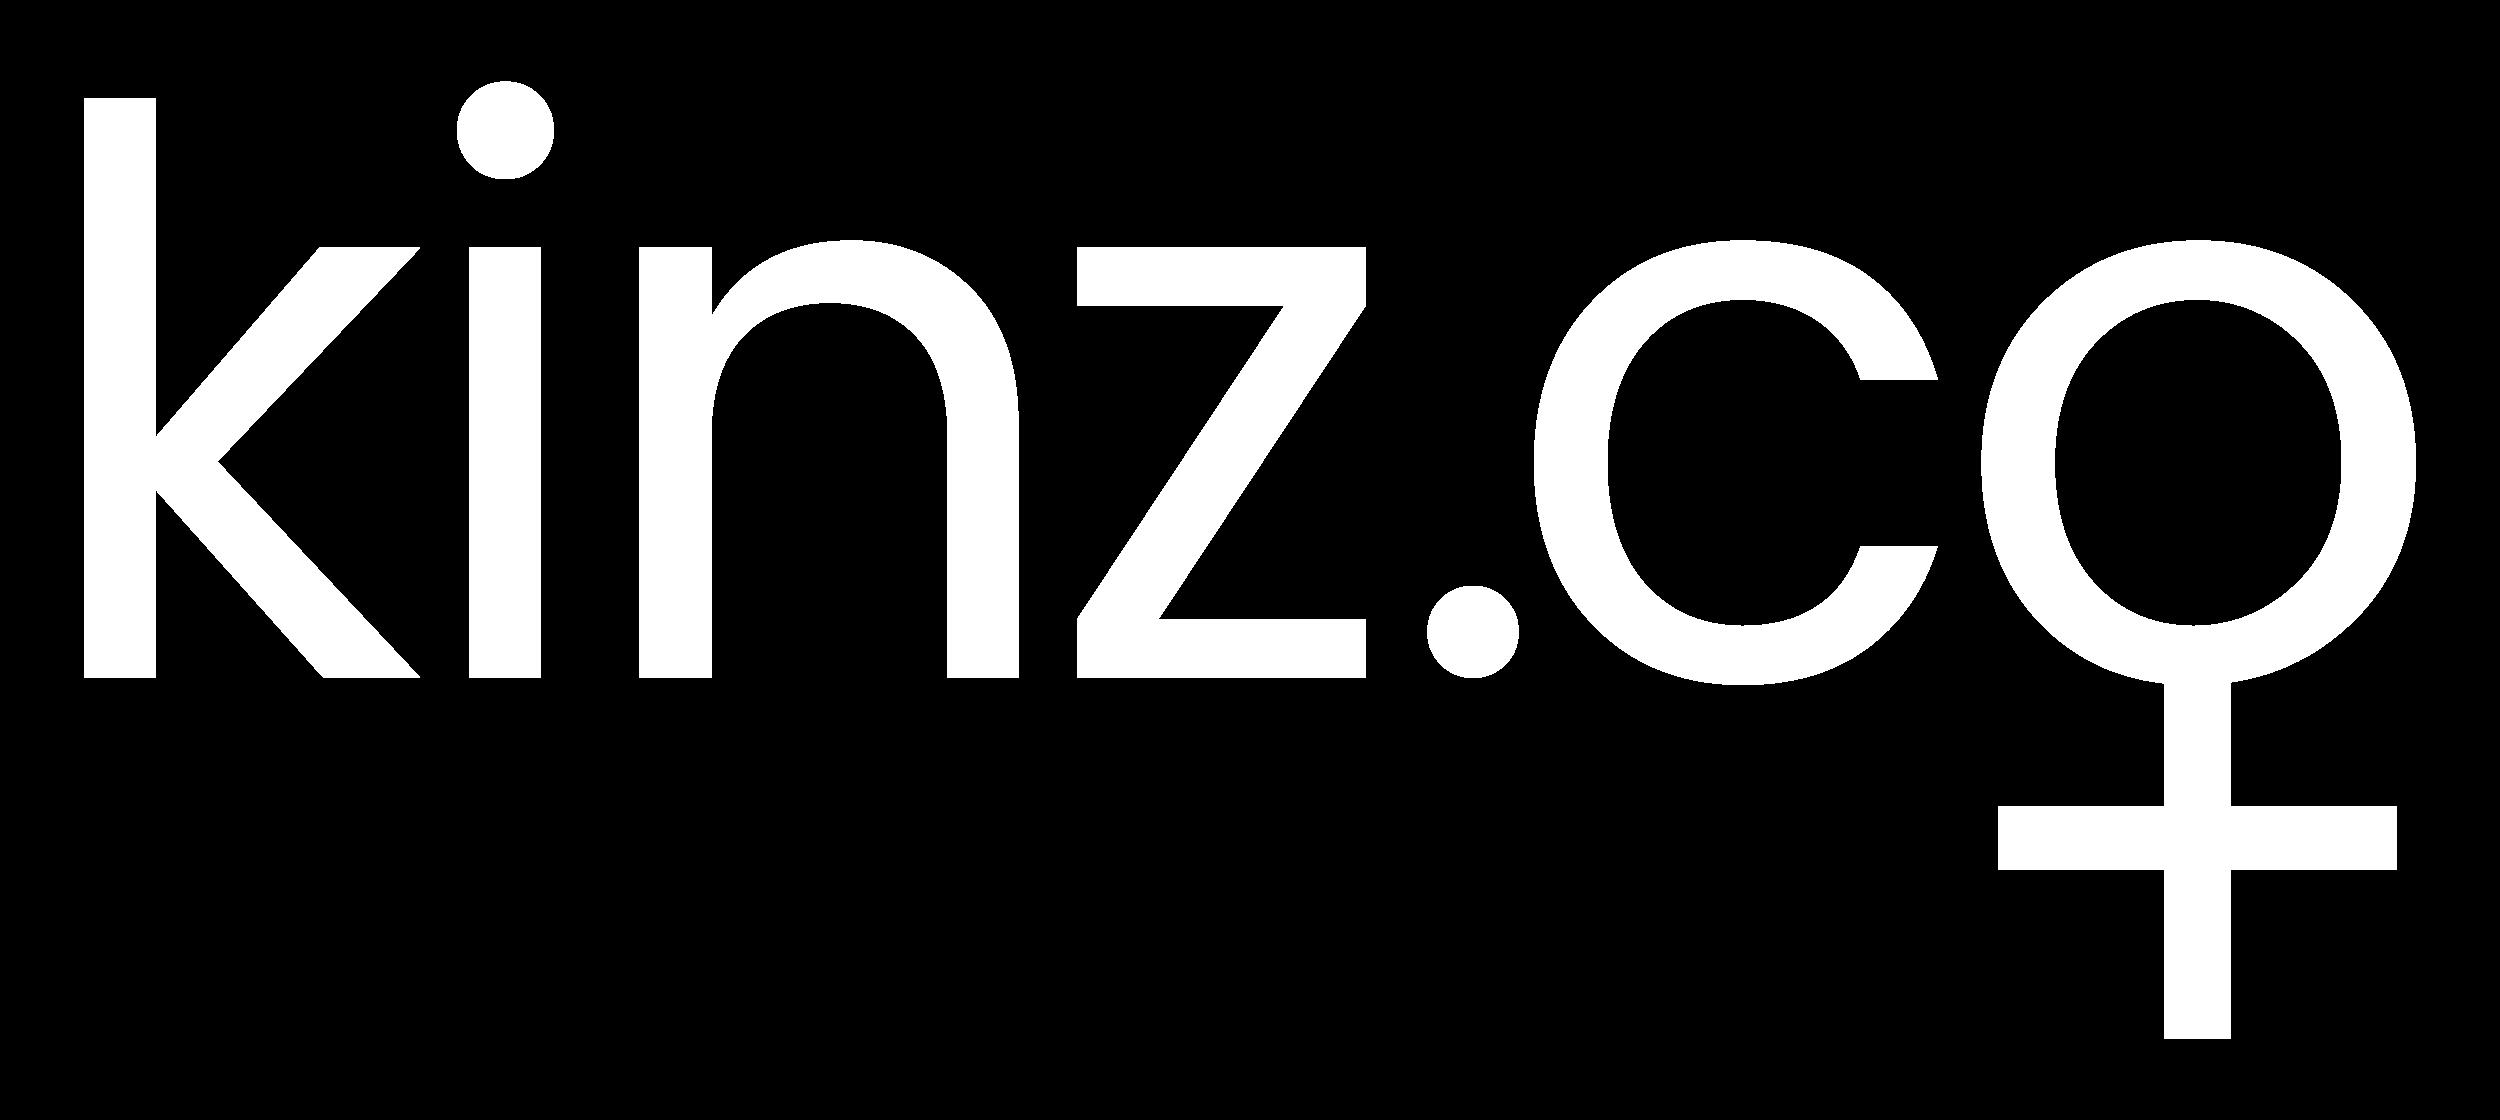 kinzcowhitebig